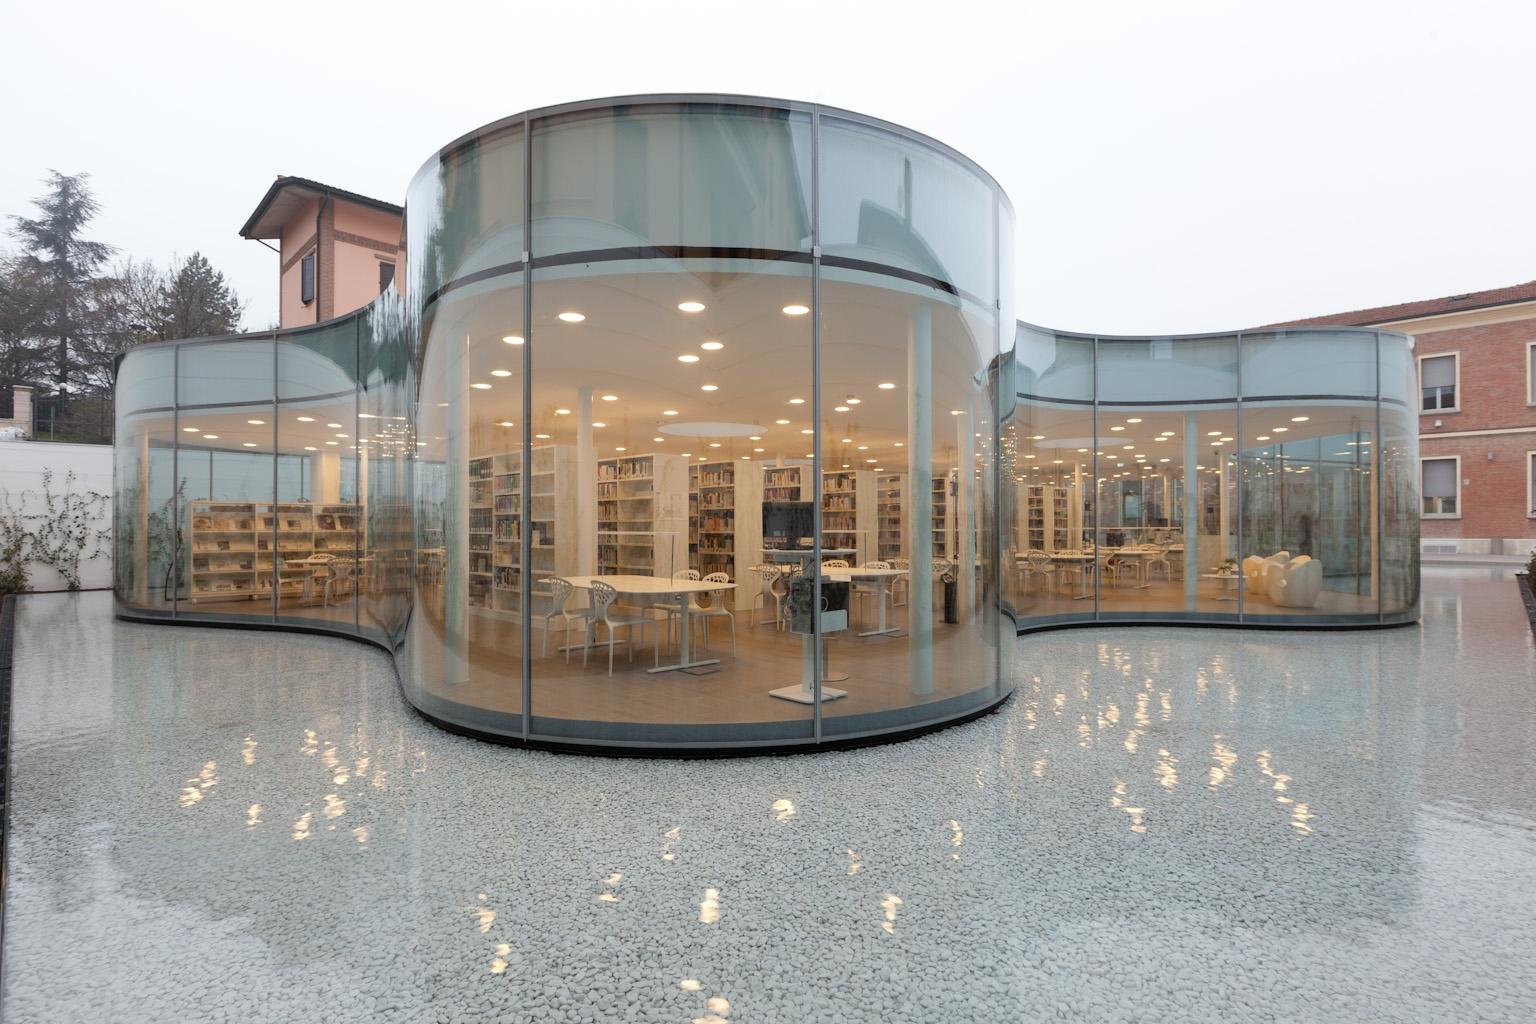 maranello_biblioteca_comunale_125.jpg